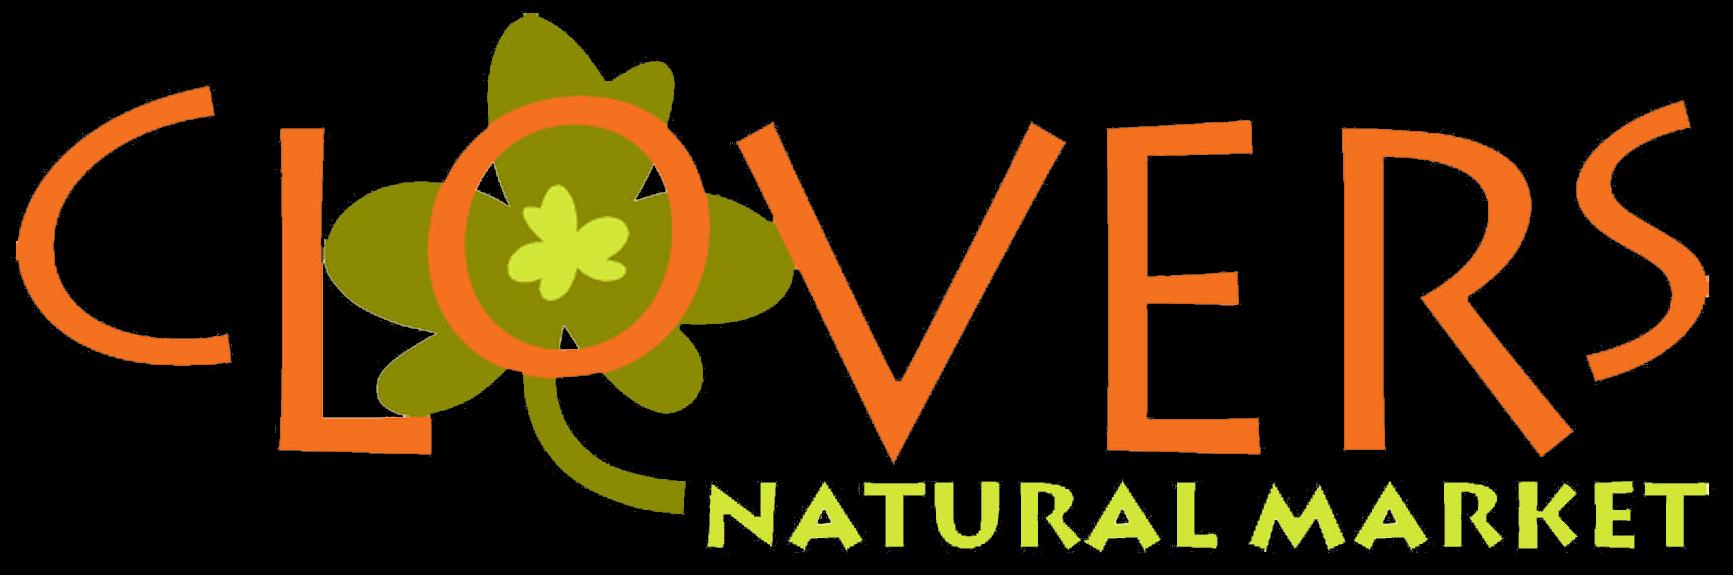 clovers logo transparent best shadow.png